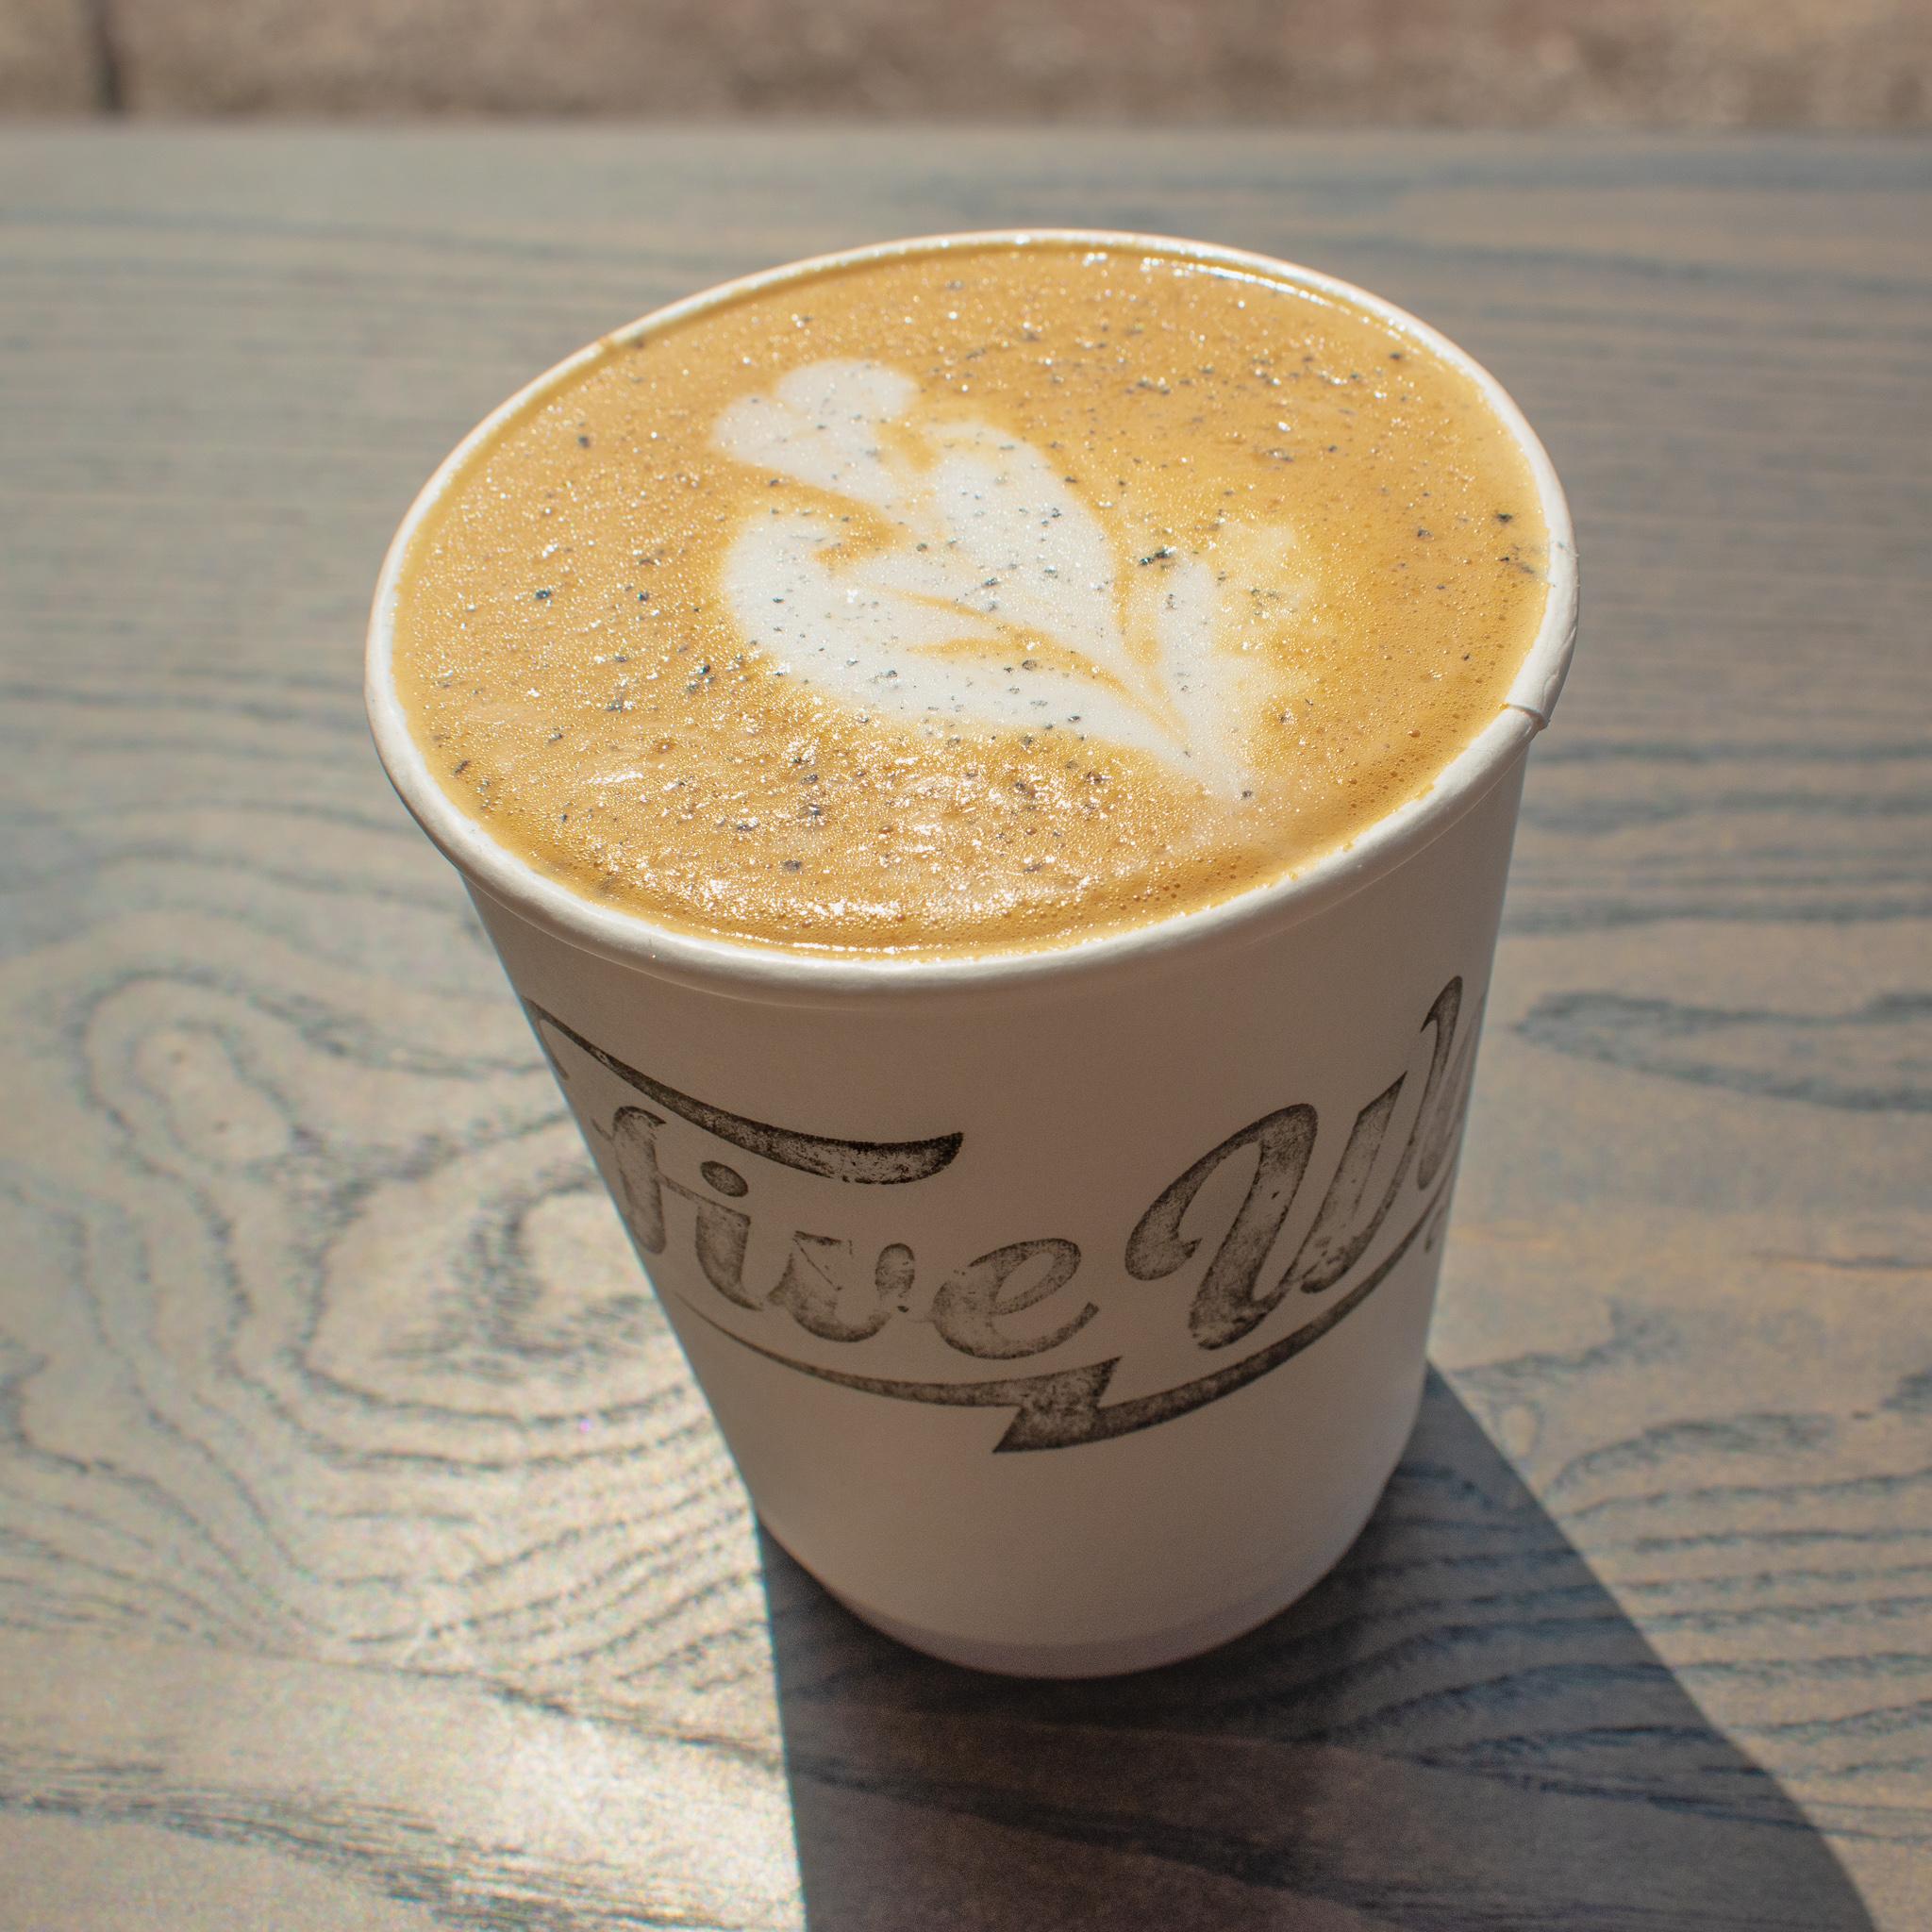 uprooted-traveler-five-watt-coffee-barista-minneapolis-st-paul-kingfield-vegan.jpg